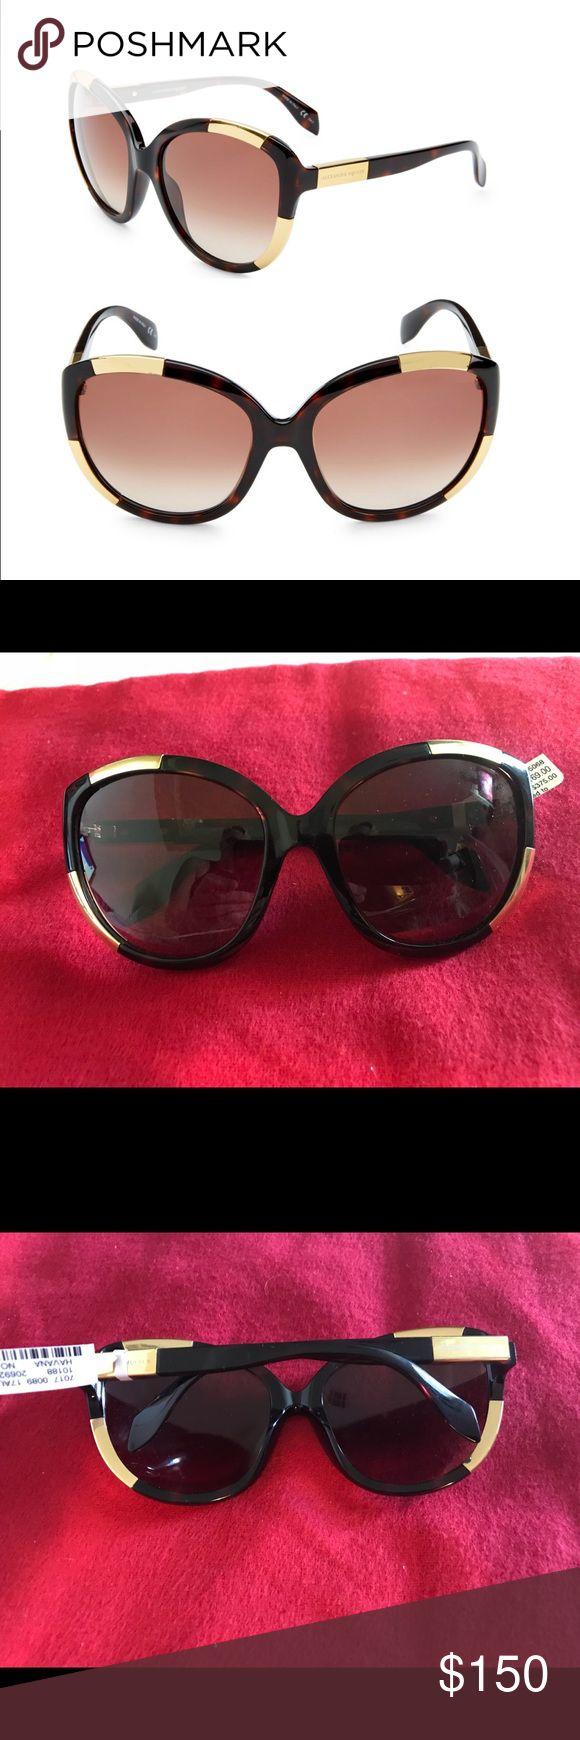 Alexander McQueen Oversized Woman's Sunglasses NWT New w Tags Alexander McQueen Accessories Sunglasses